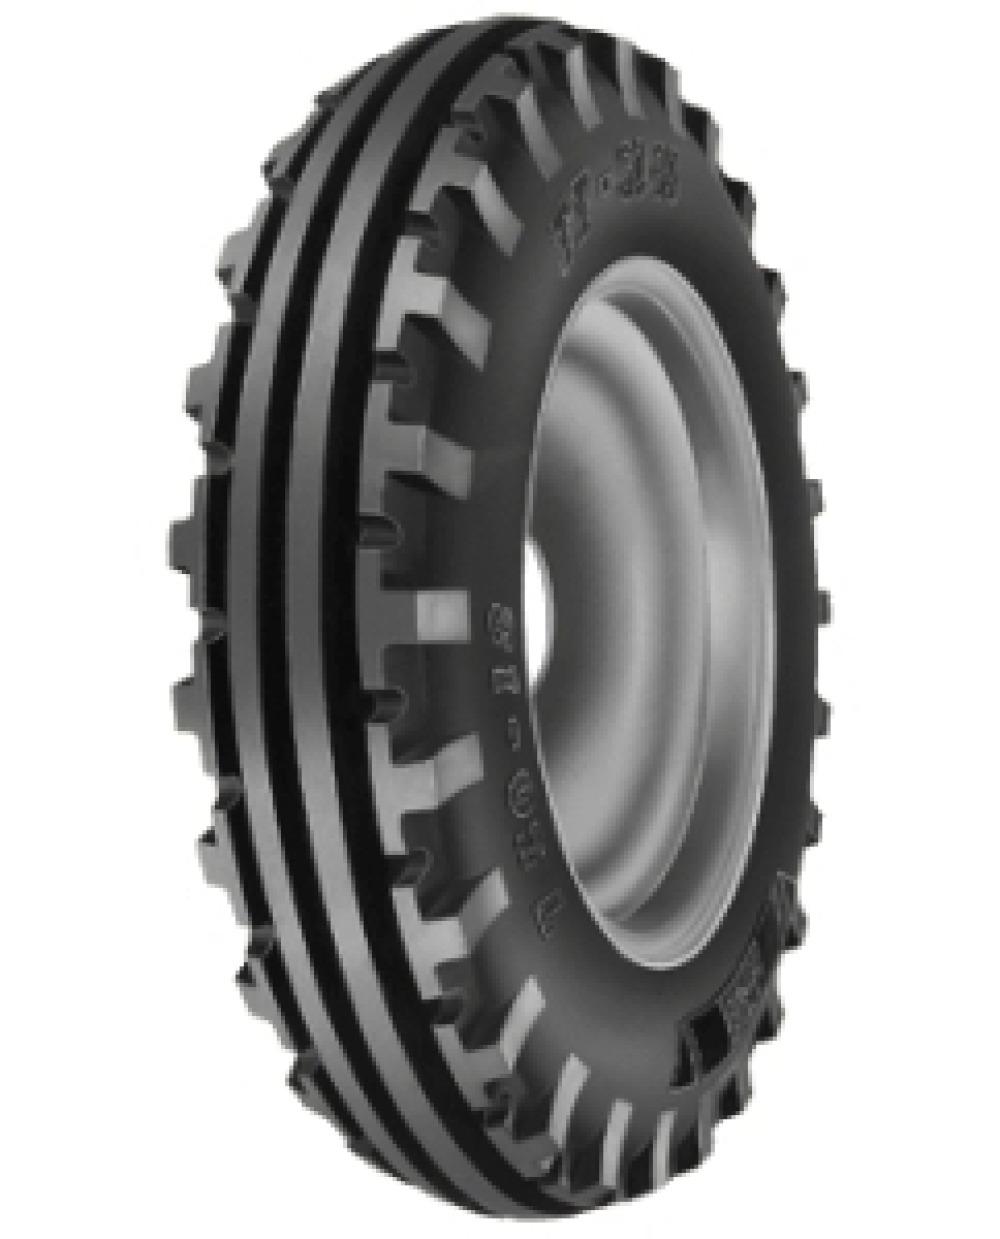 BKT 6,00 -19 6PR TF-8181 TT I.O.(Mg.abroncs)